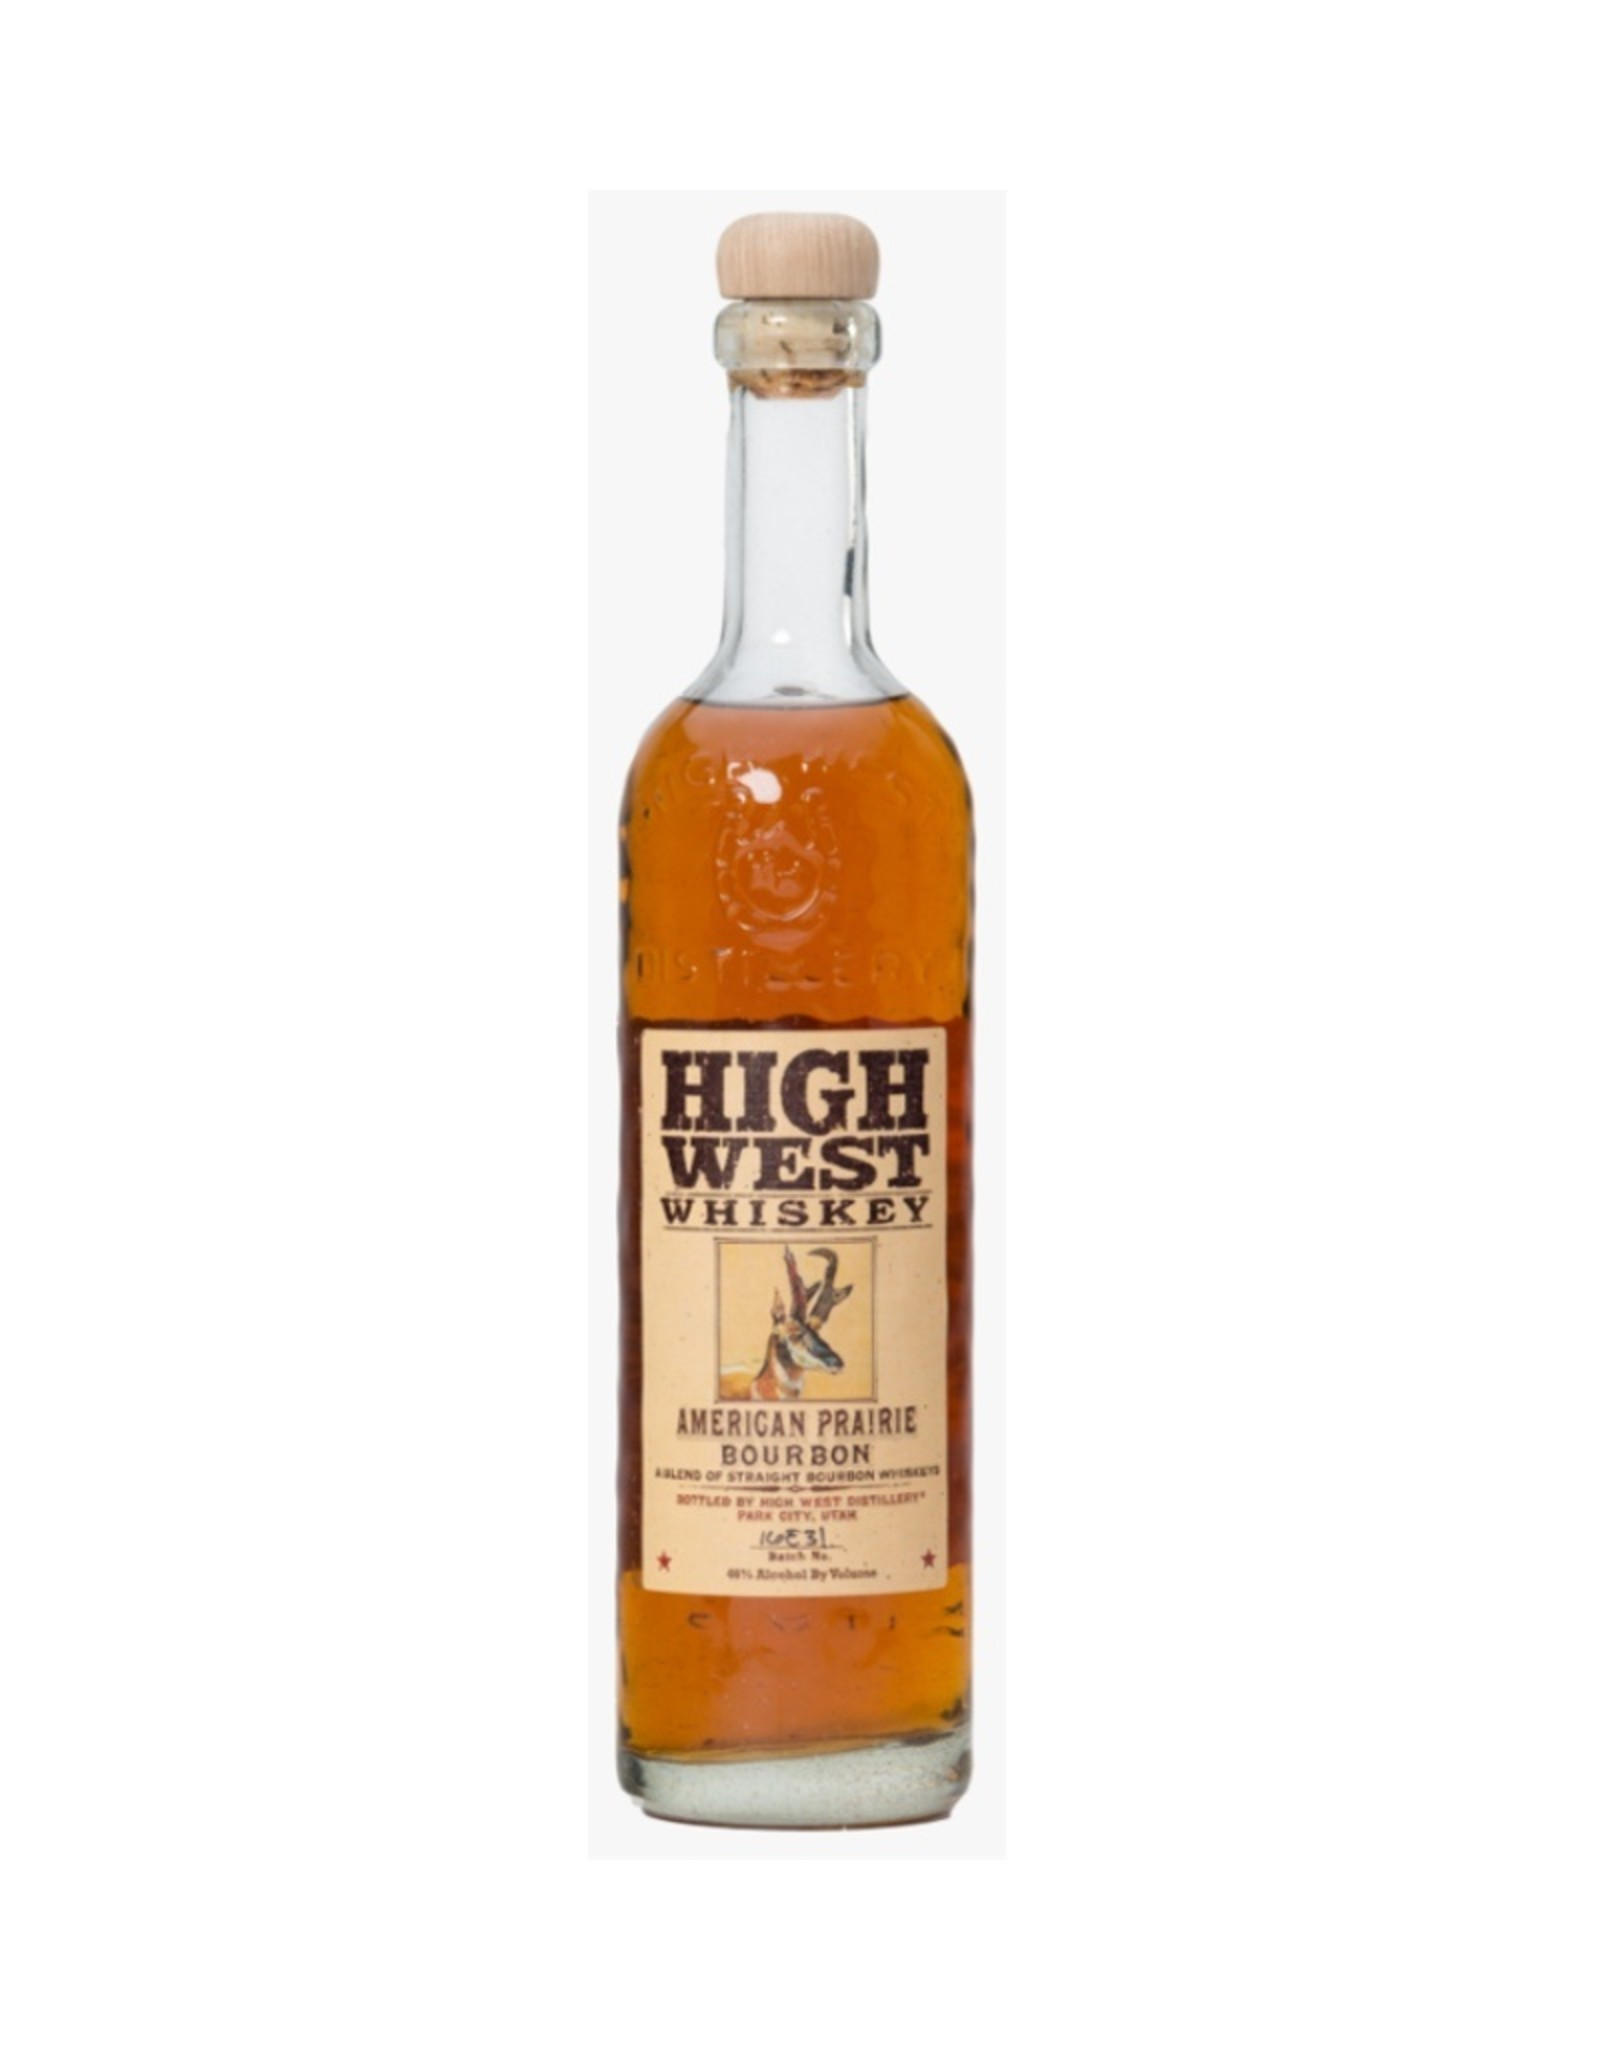 High West High West American Prairie Bourbon